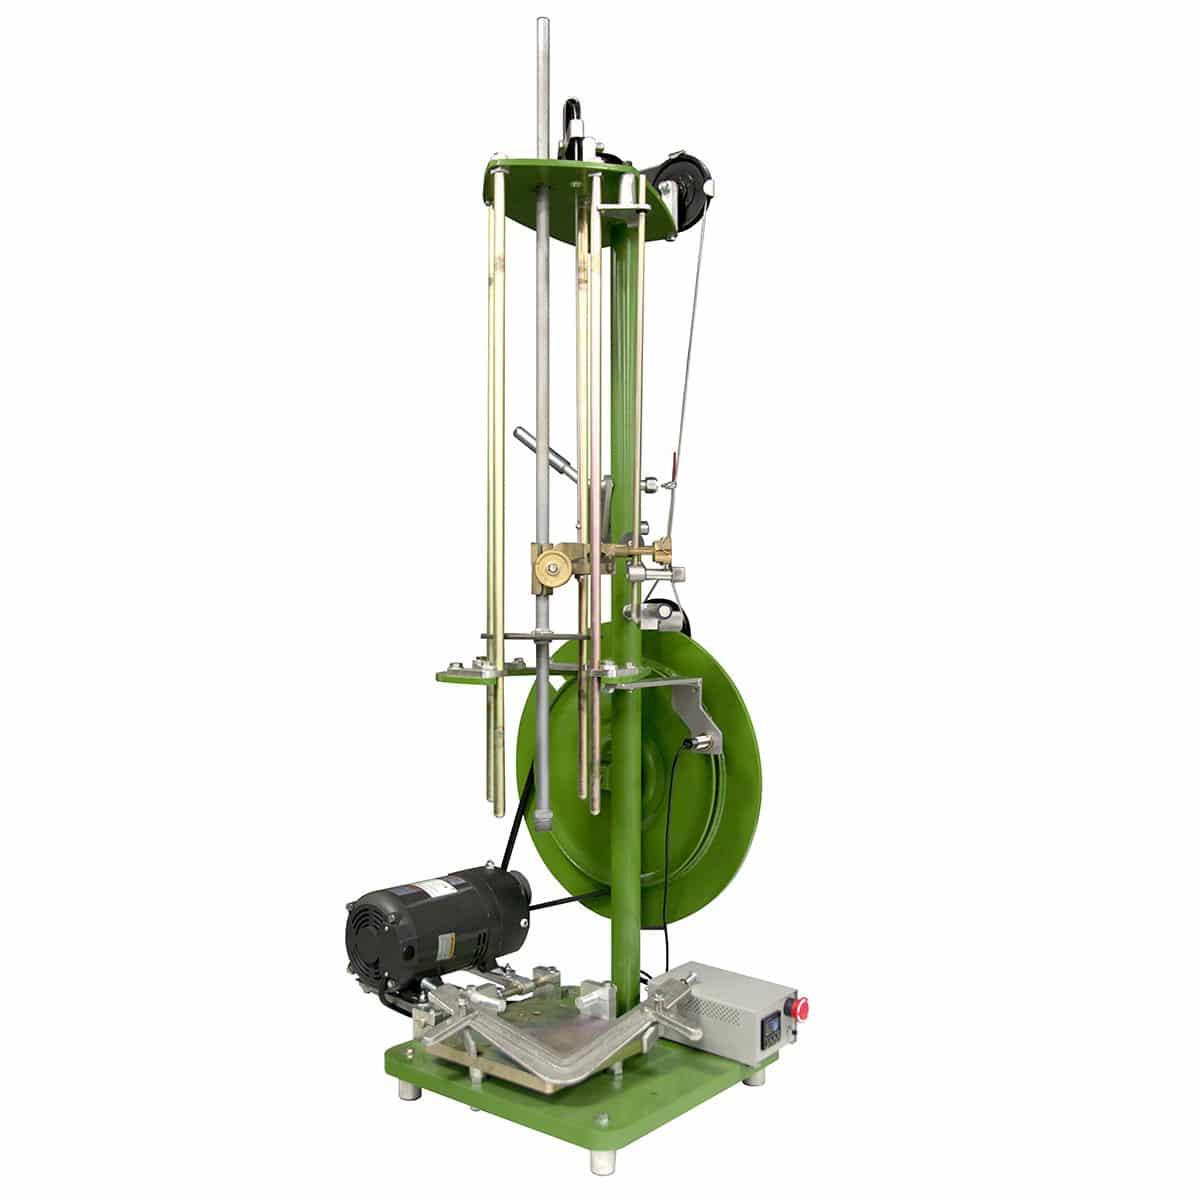 Rainhart Proctor Soil Compactor